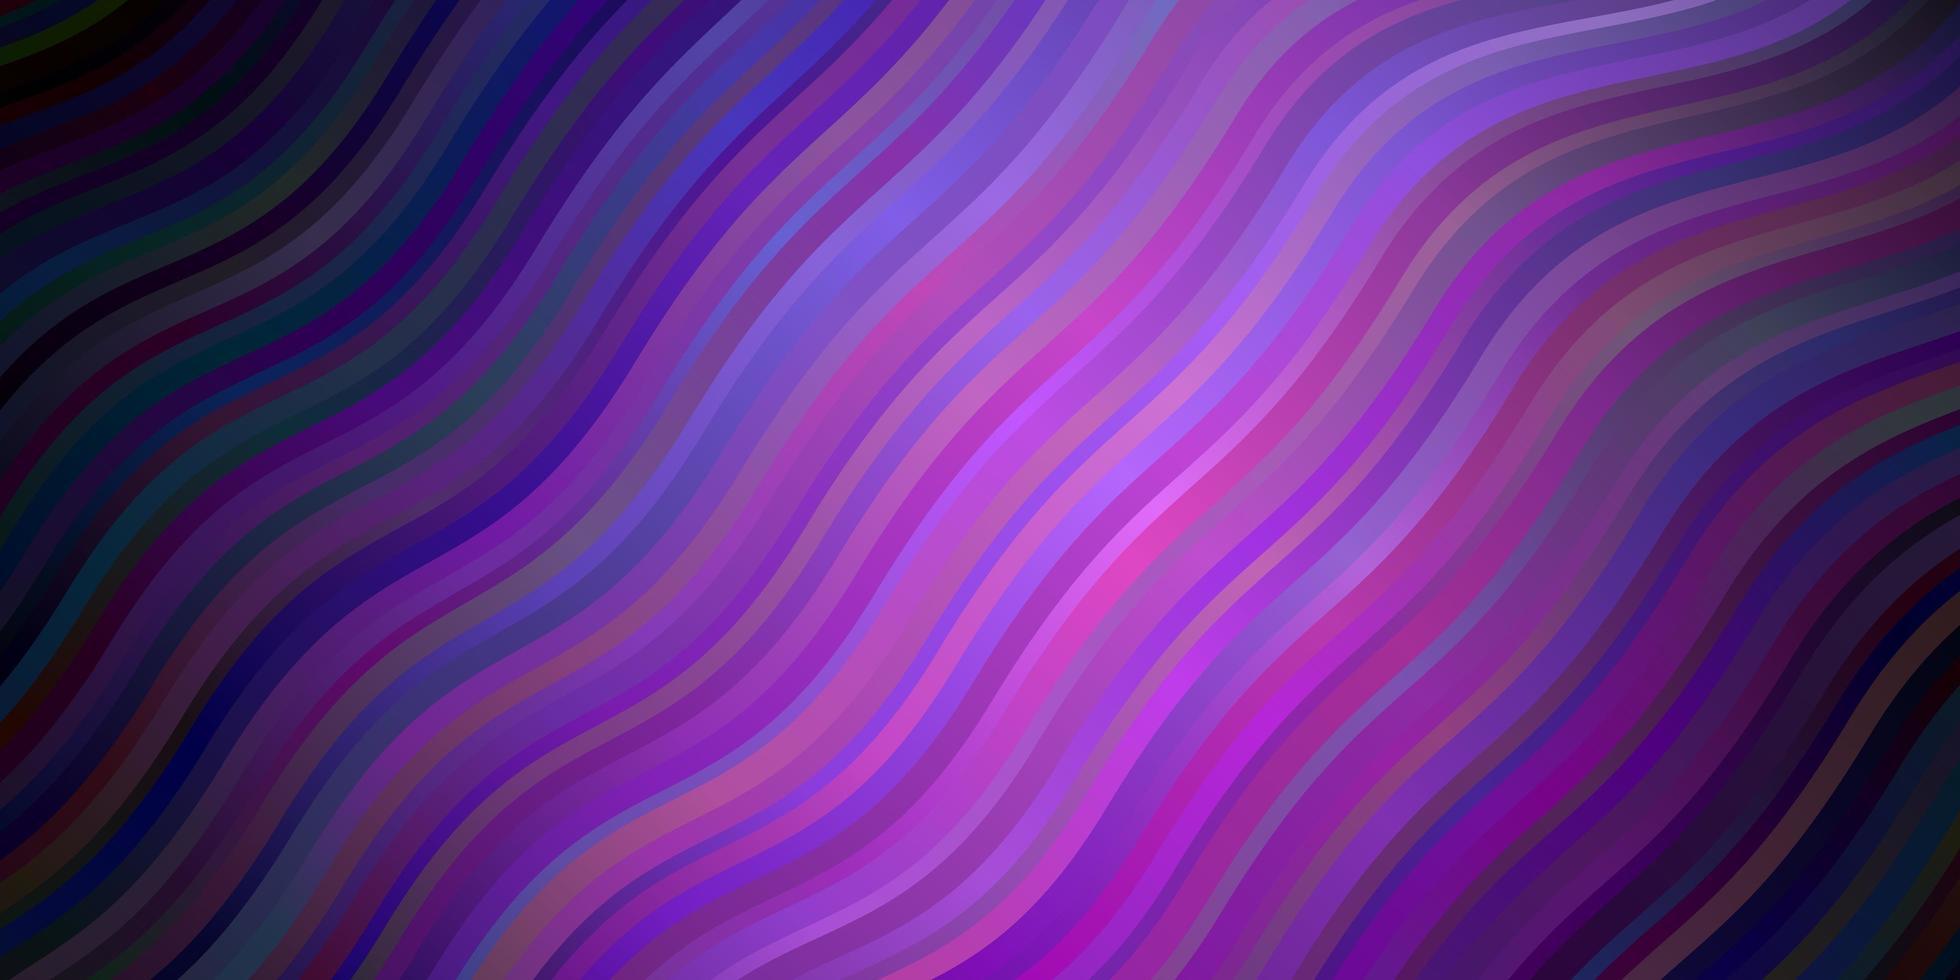 plantilla de vector de color púrpura oscuro, rosa con curvas.